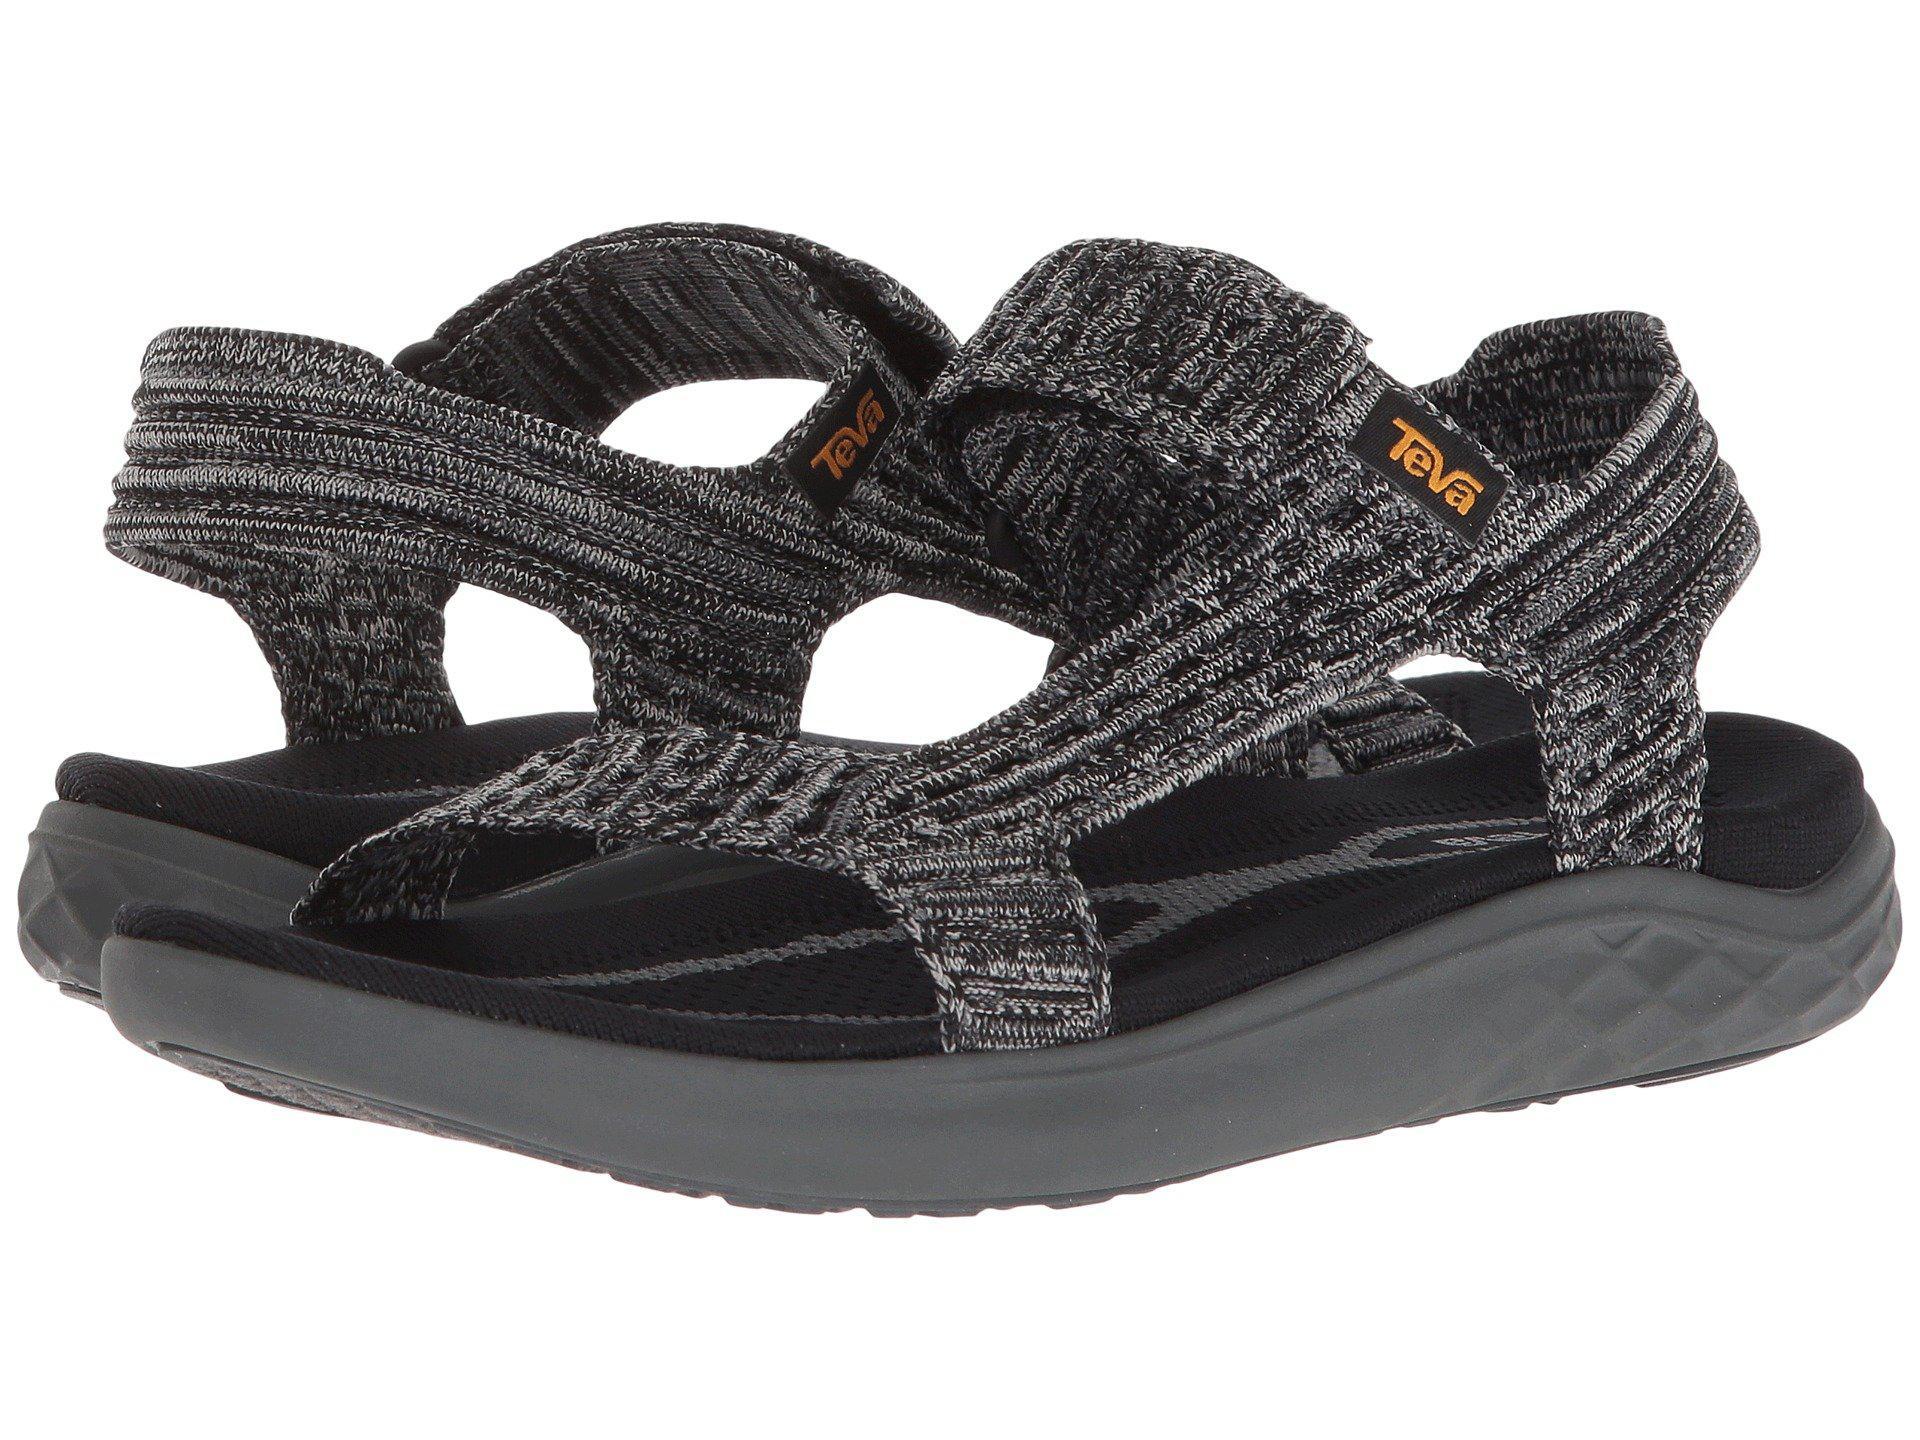 b5c88cb940bb Lyst - Teva Terra-float 2 Knit Universal (black grey) Women s Shoes ...